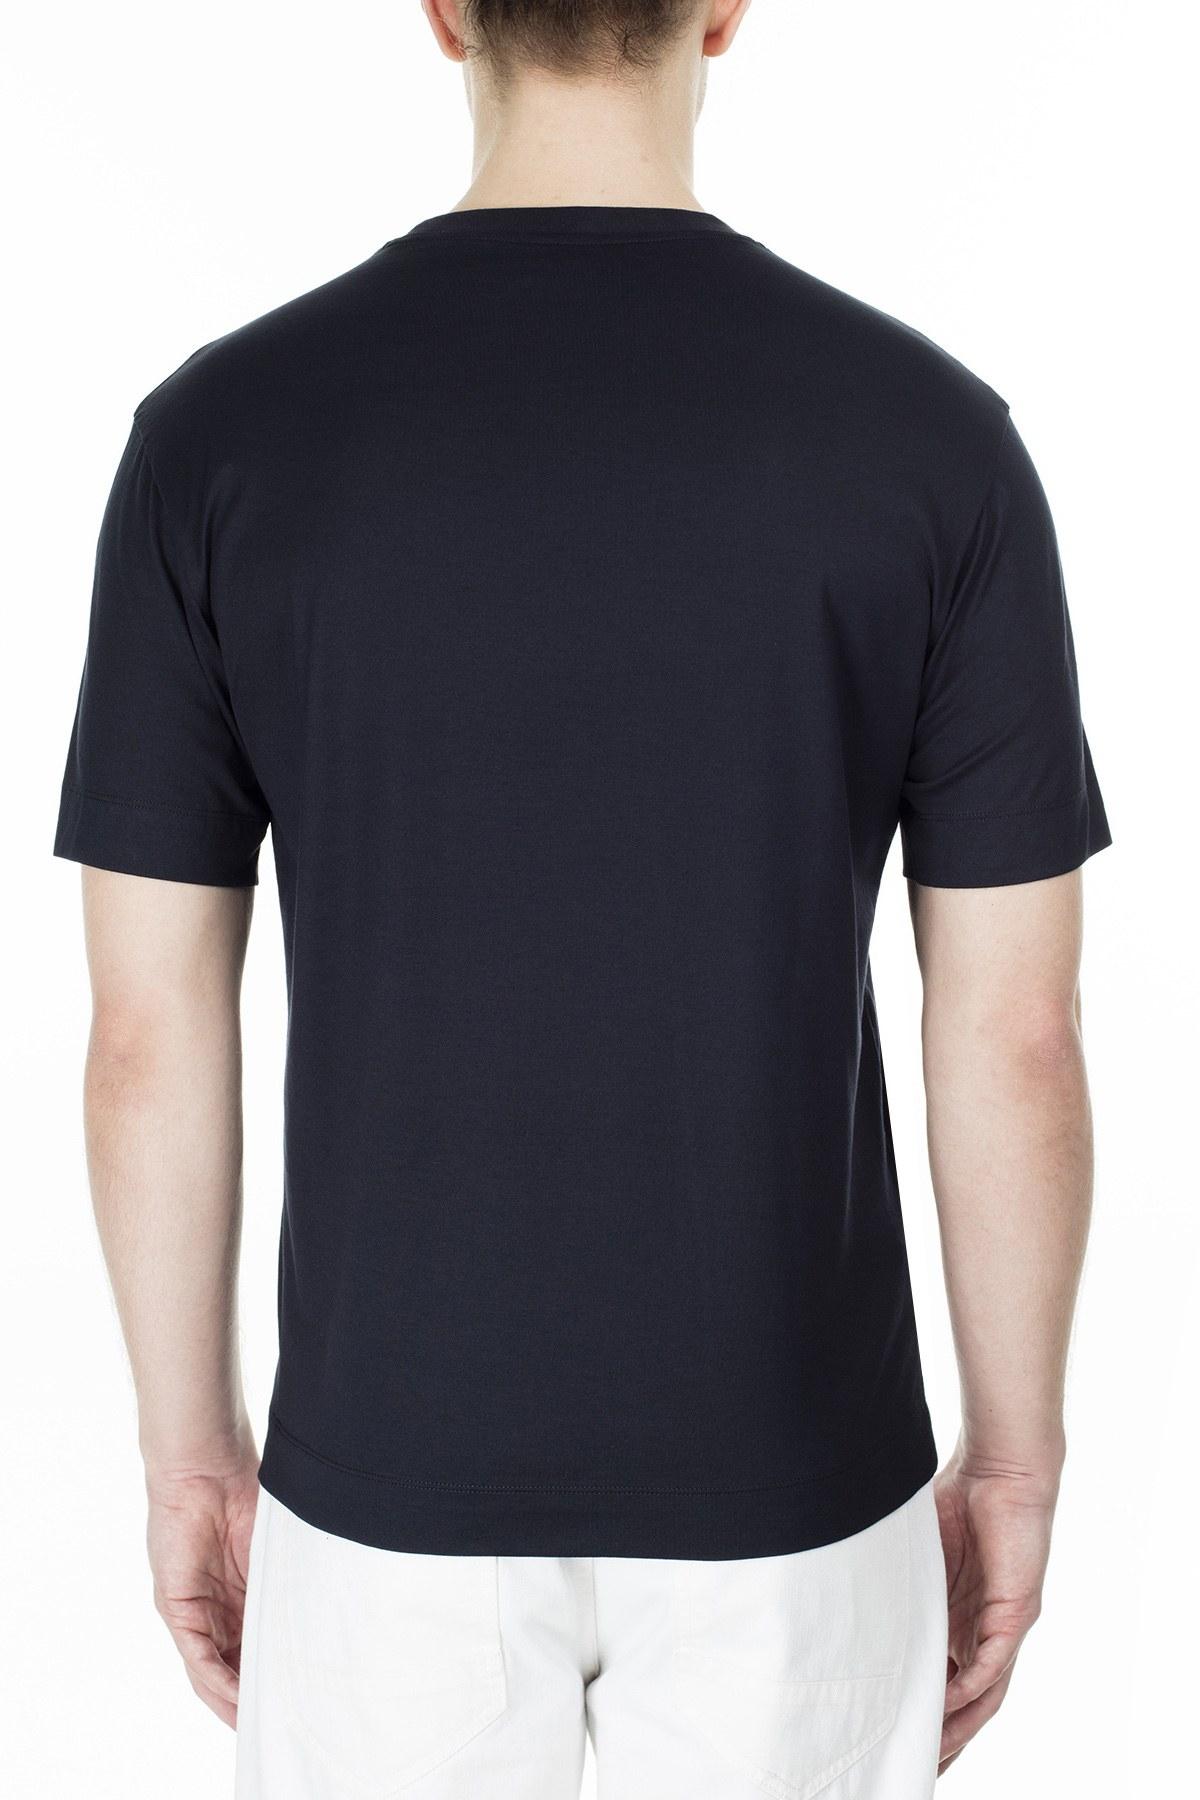 Emporio Armani Erkek T Shirt 3H1TN1 1JCQZ G940 LACİVERT